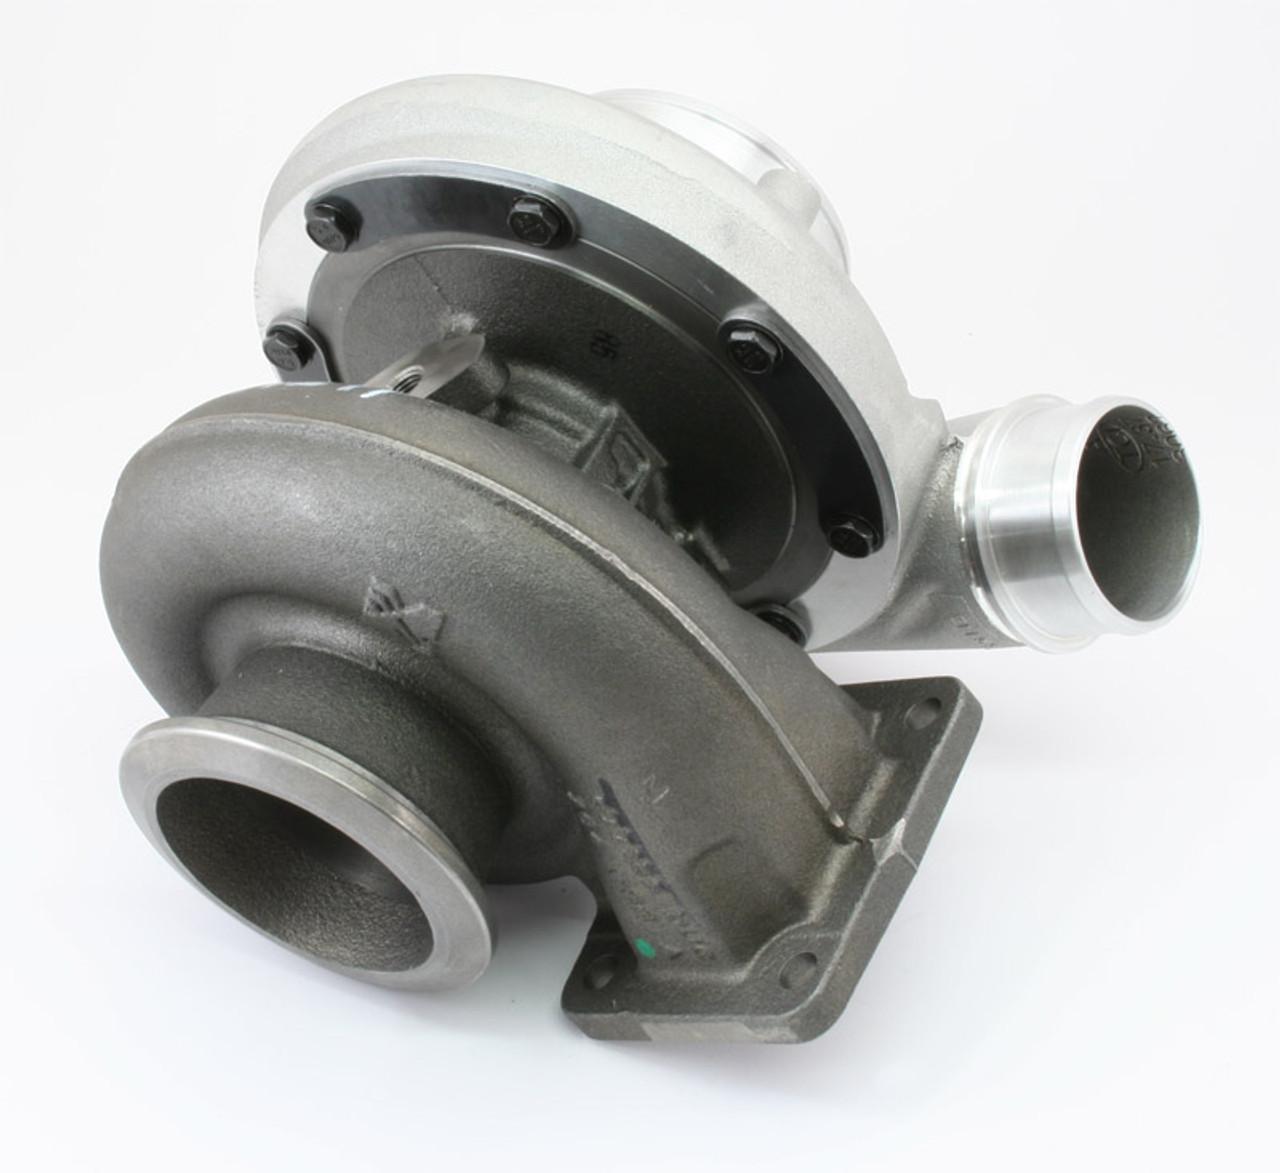 Borg Warner S364.5 SX-E 8780 64.5/73 13009097055